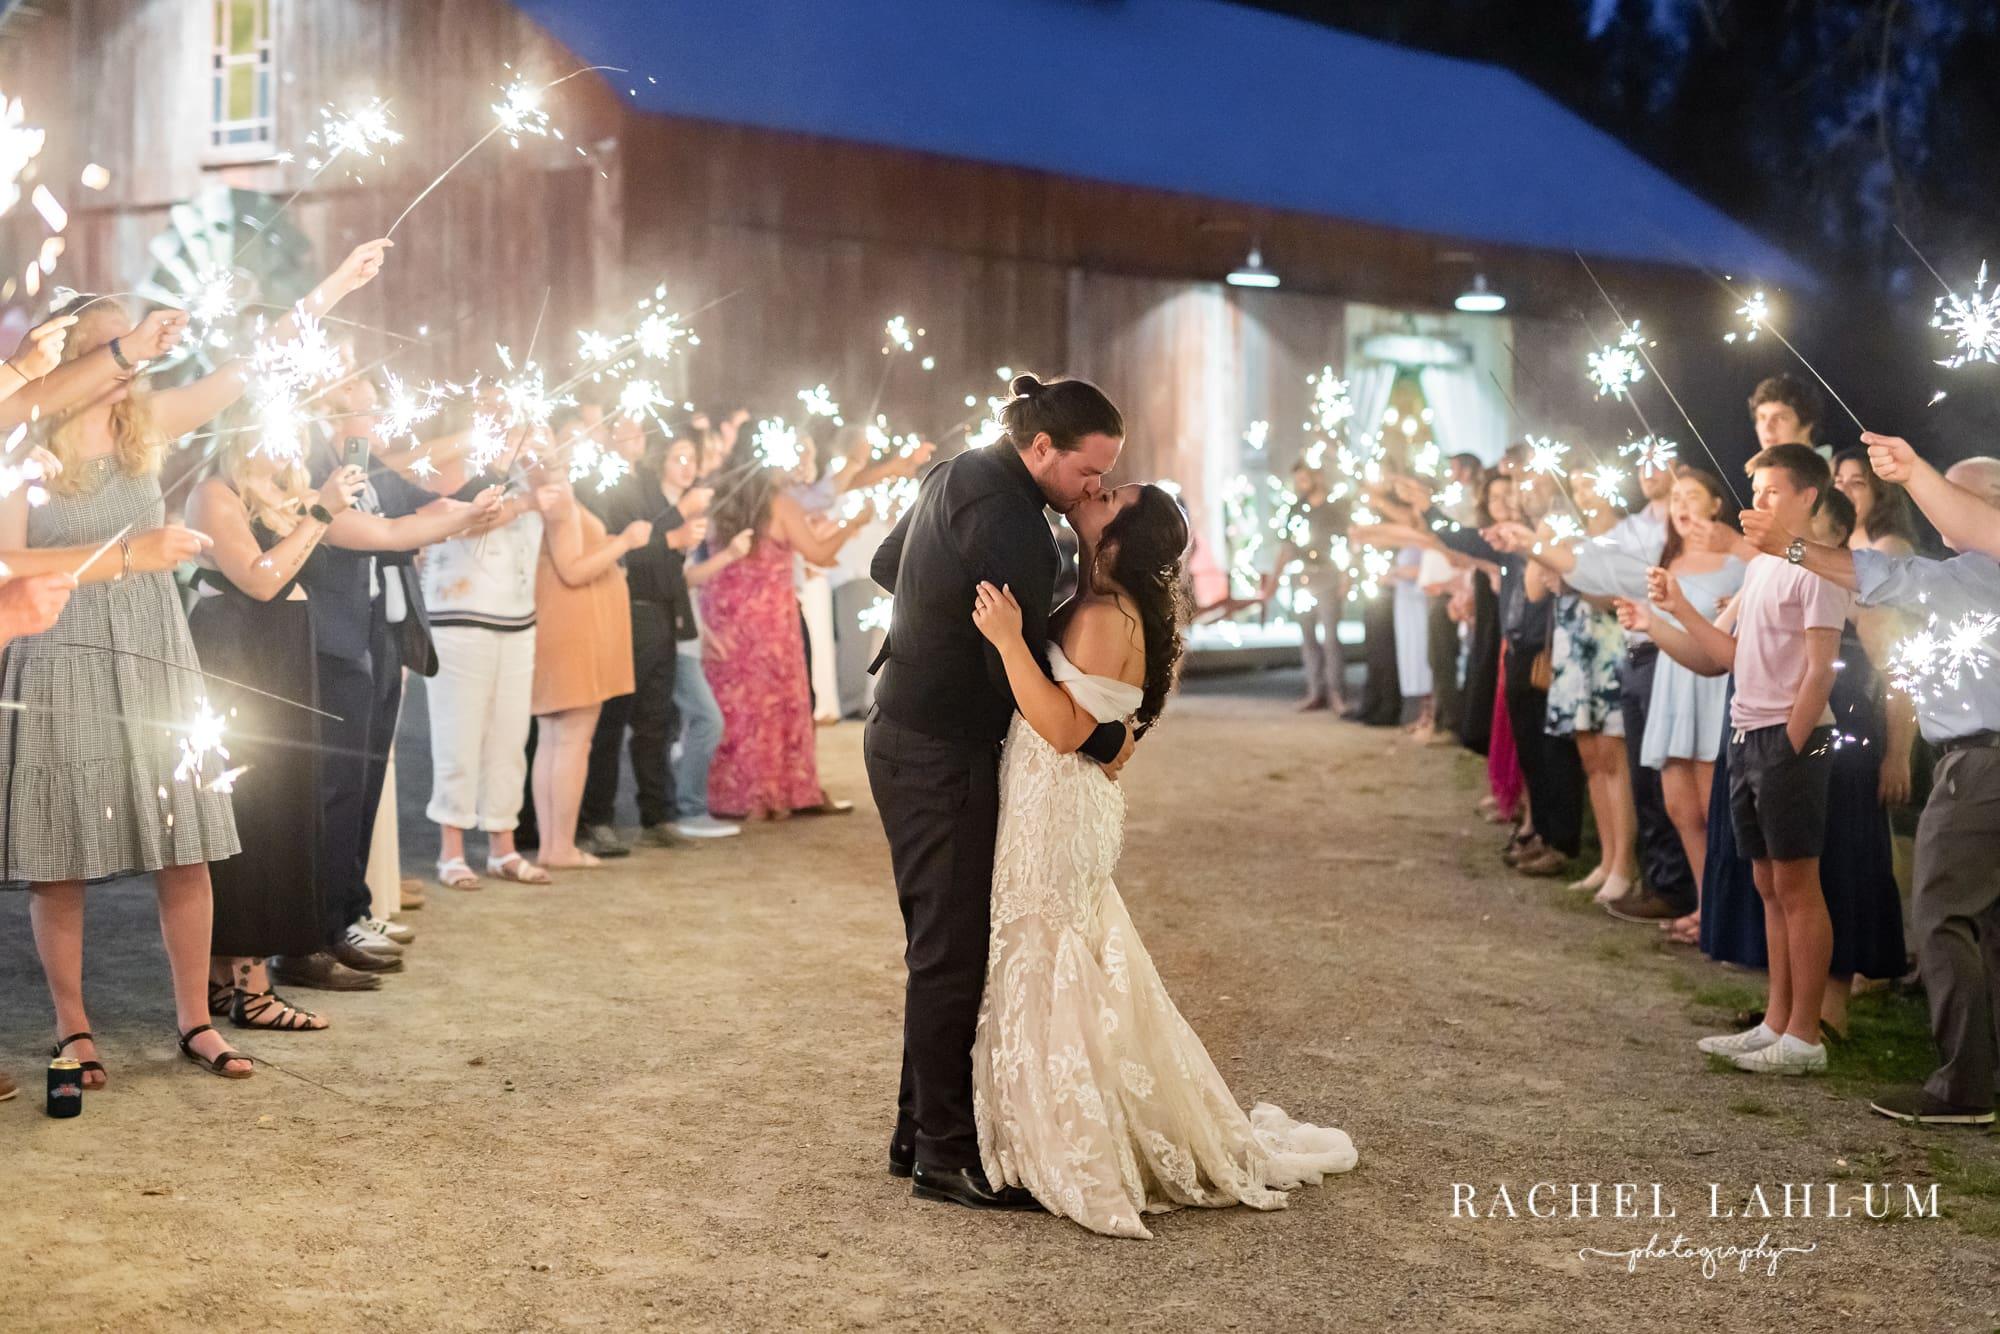 Bride and groom kiss in sparkler tunnel at Wilderness Wedding Barn in Bigfork, MN.